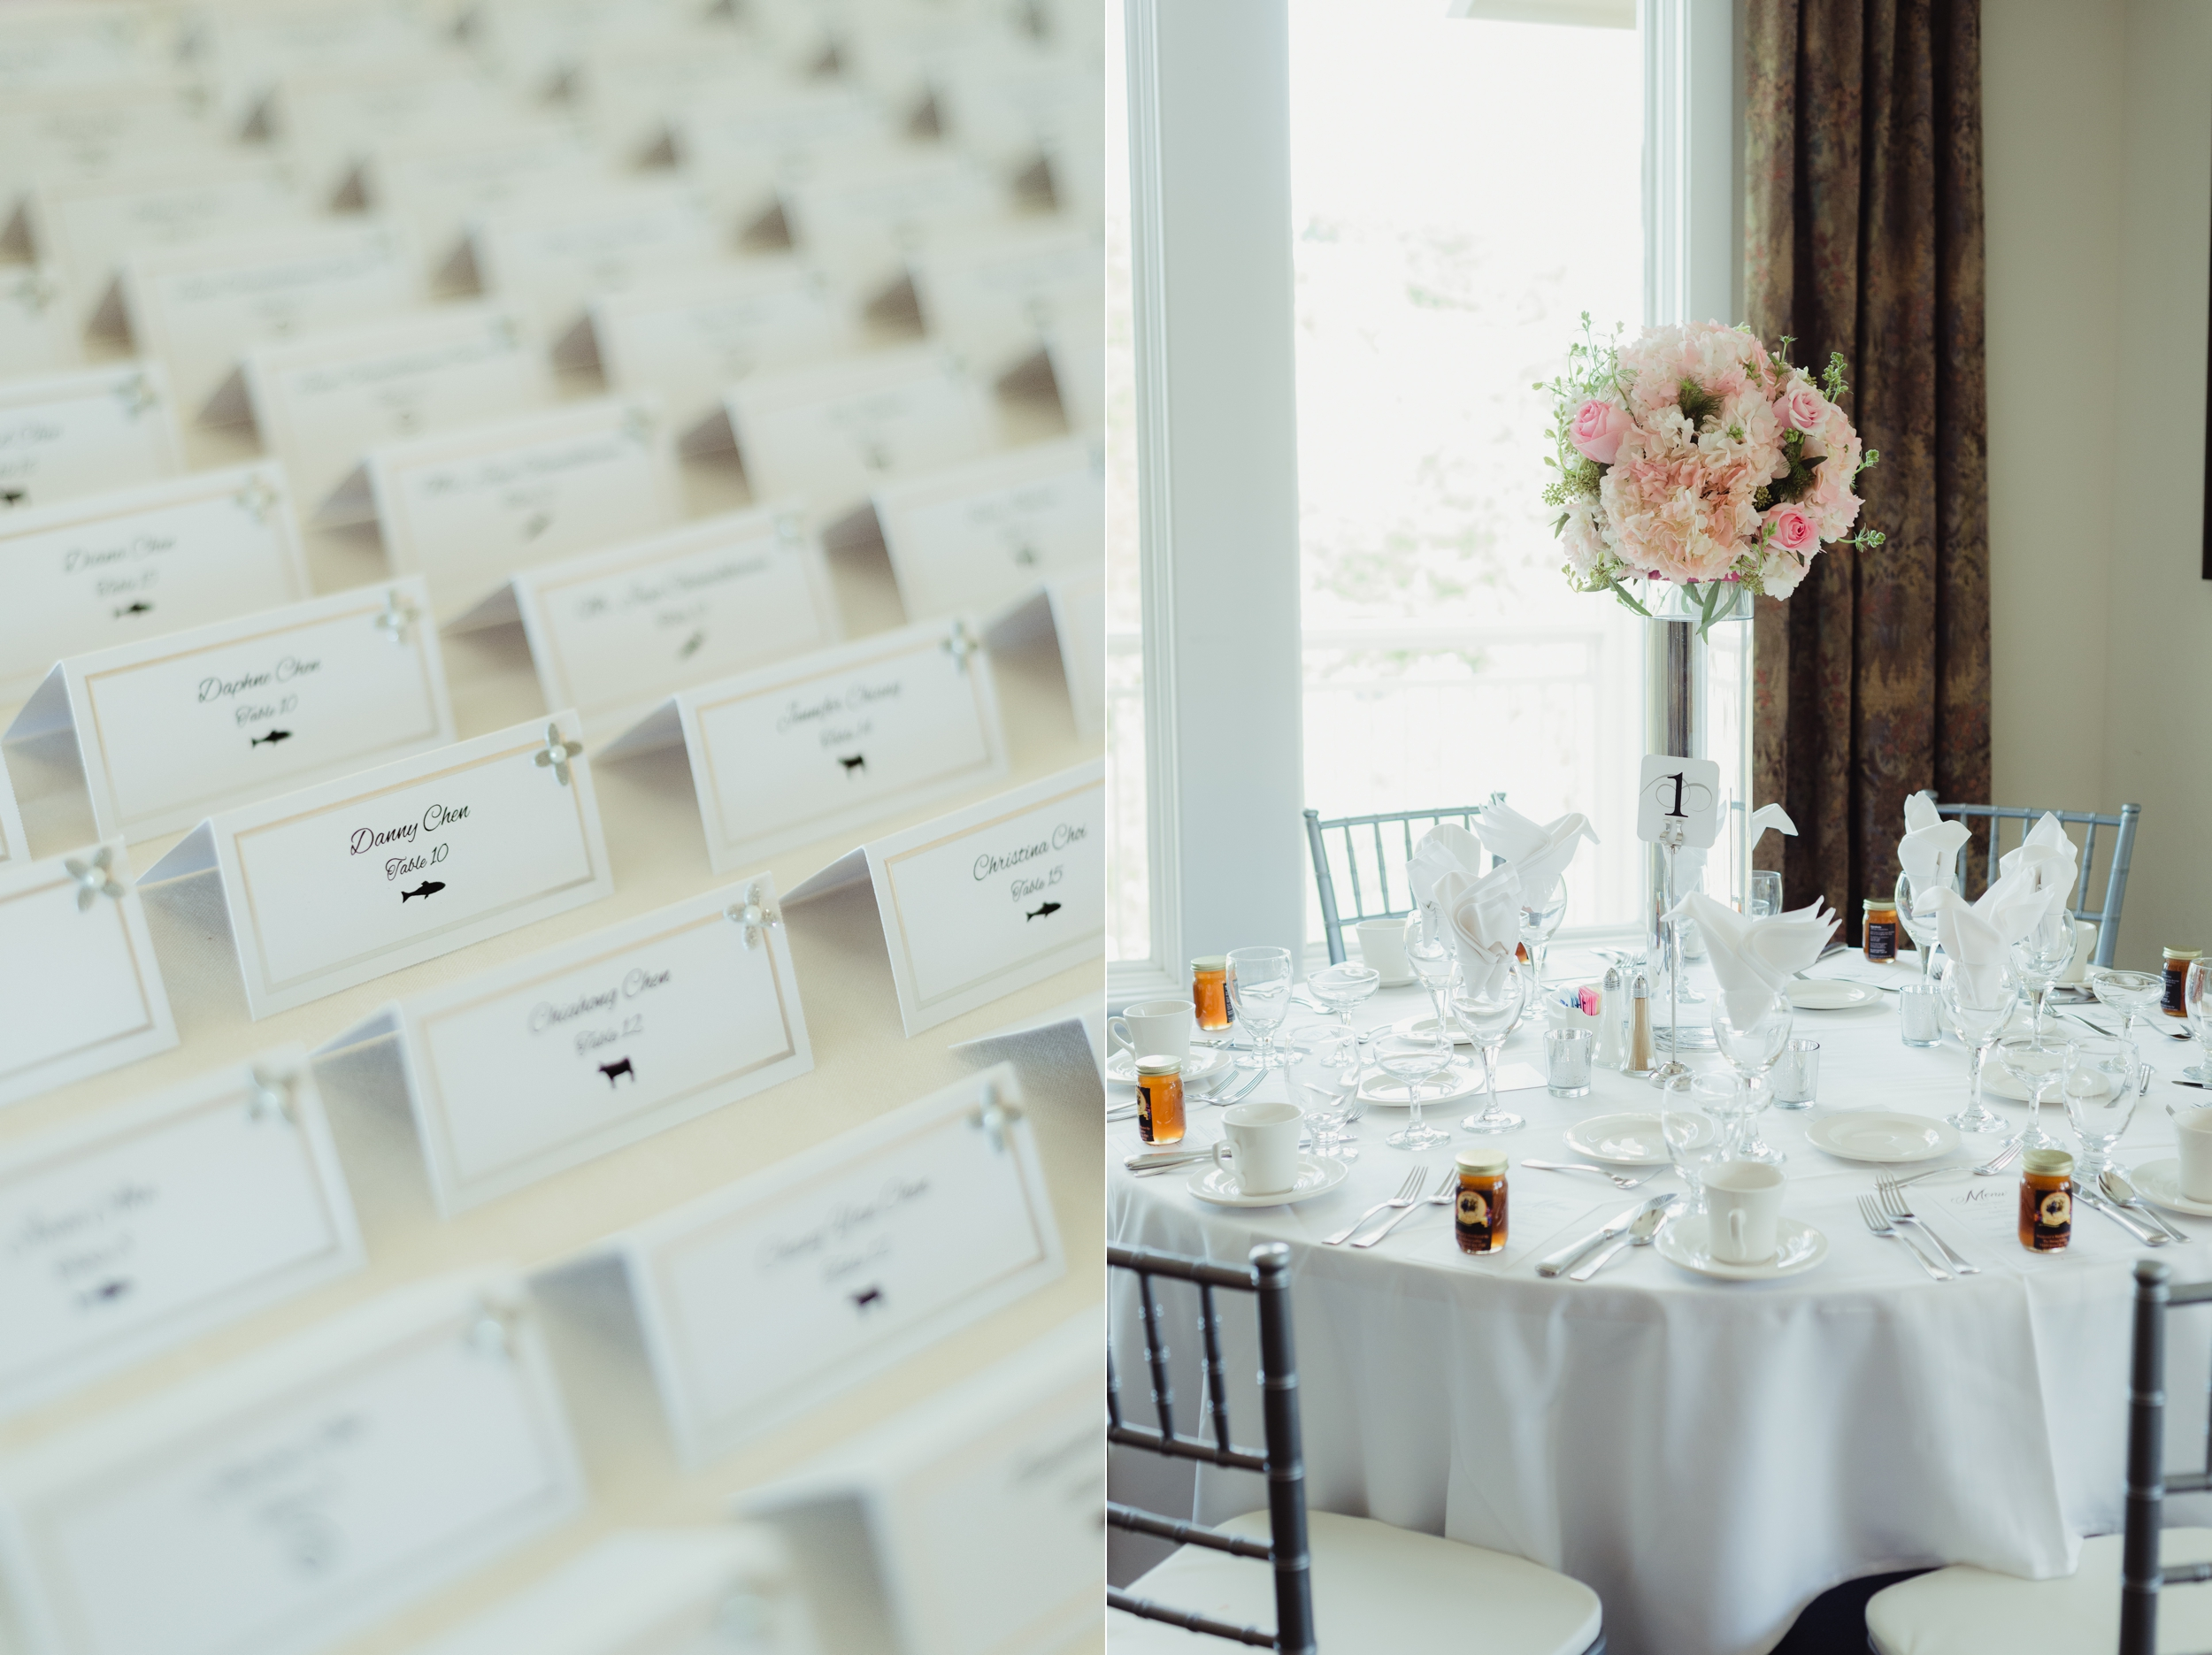 25-saratoga-country-club-wedding-vivianchen-016_WEB.jpg